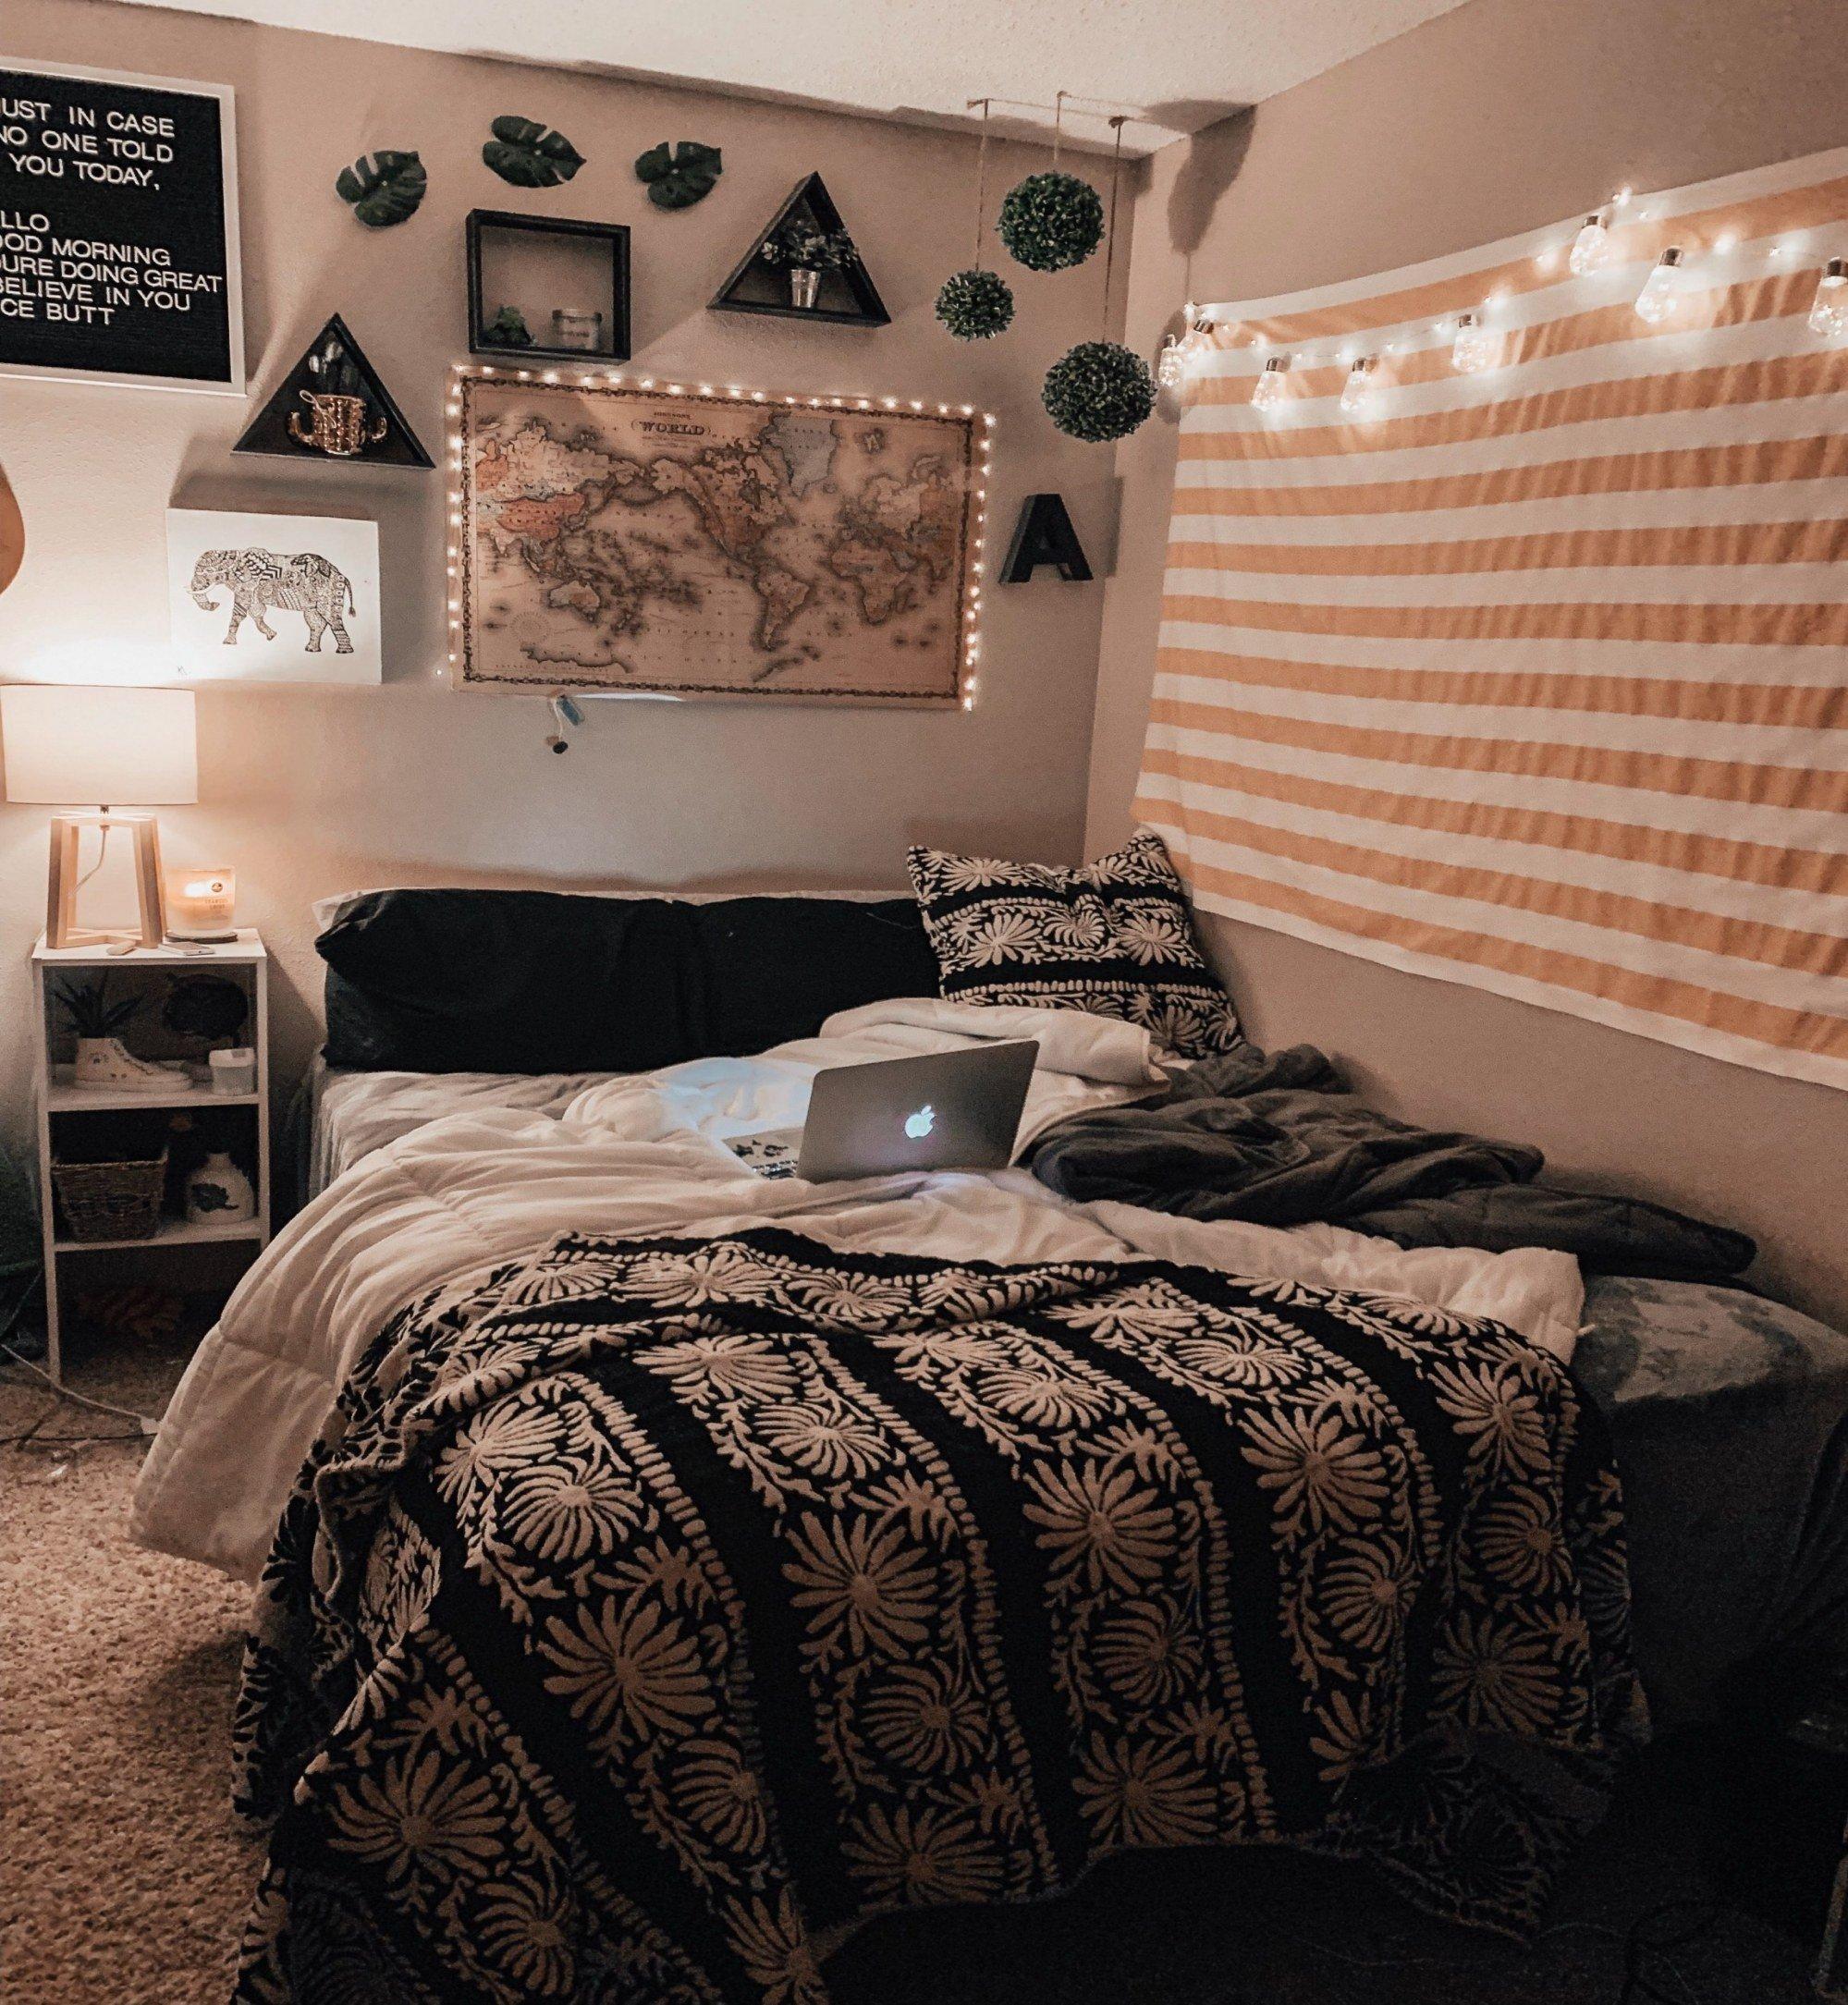 Teen Bedroom Wall Decor Best Of Blue Room Ideas Cute Room Ideas for Teenage Girl Room